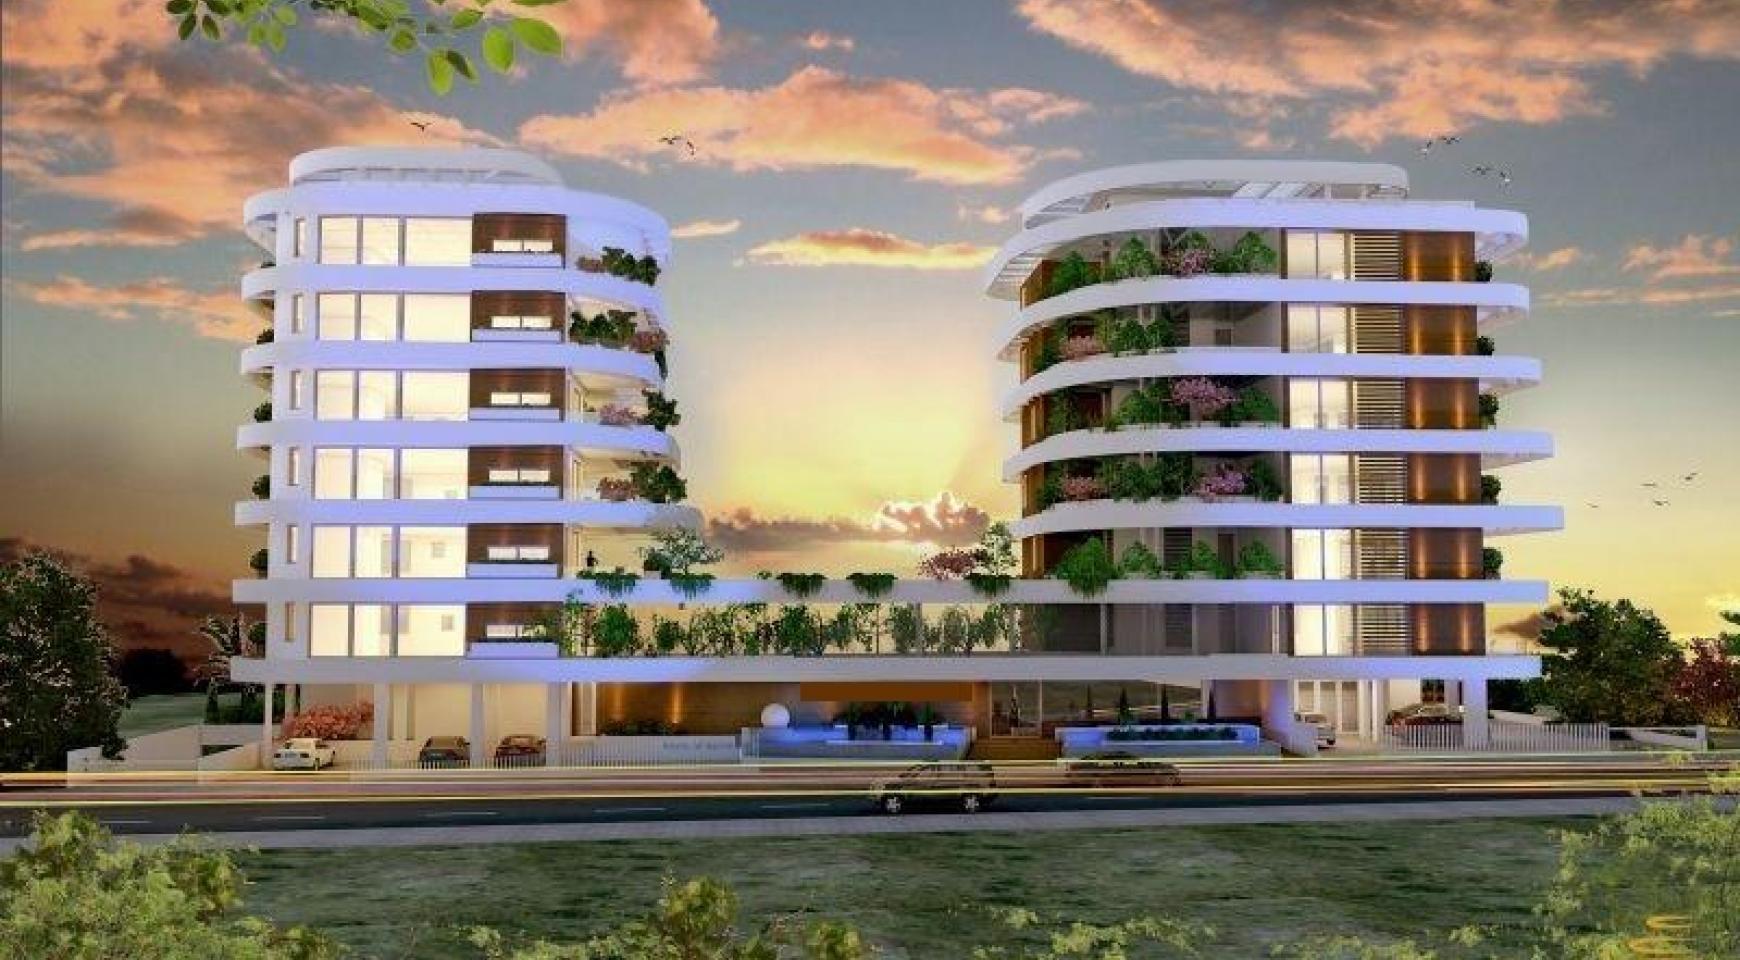 New 3 Bedroom Apartment near the Sea - 2